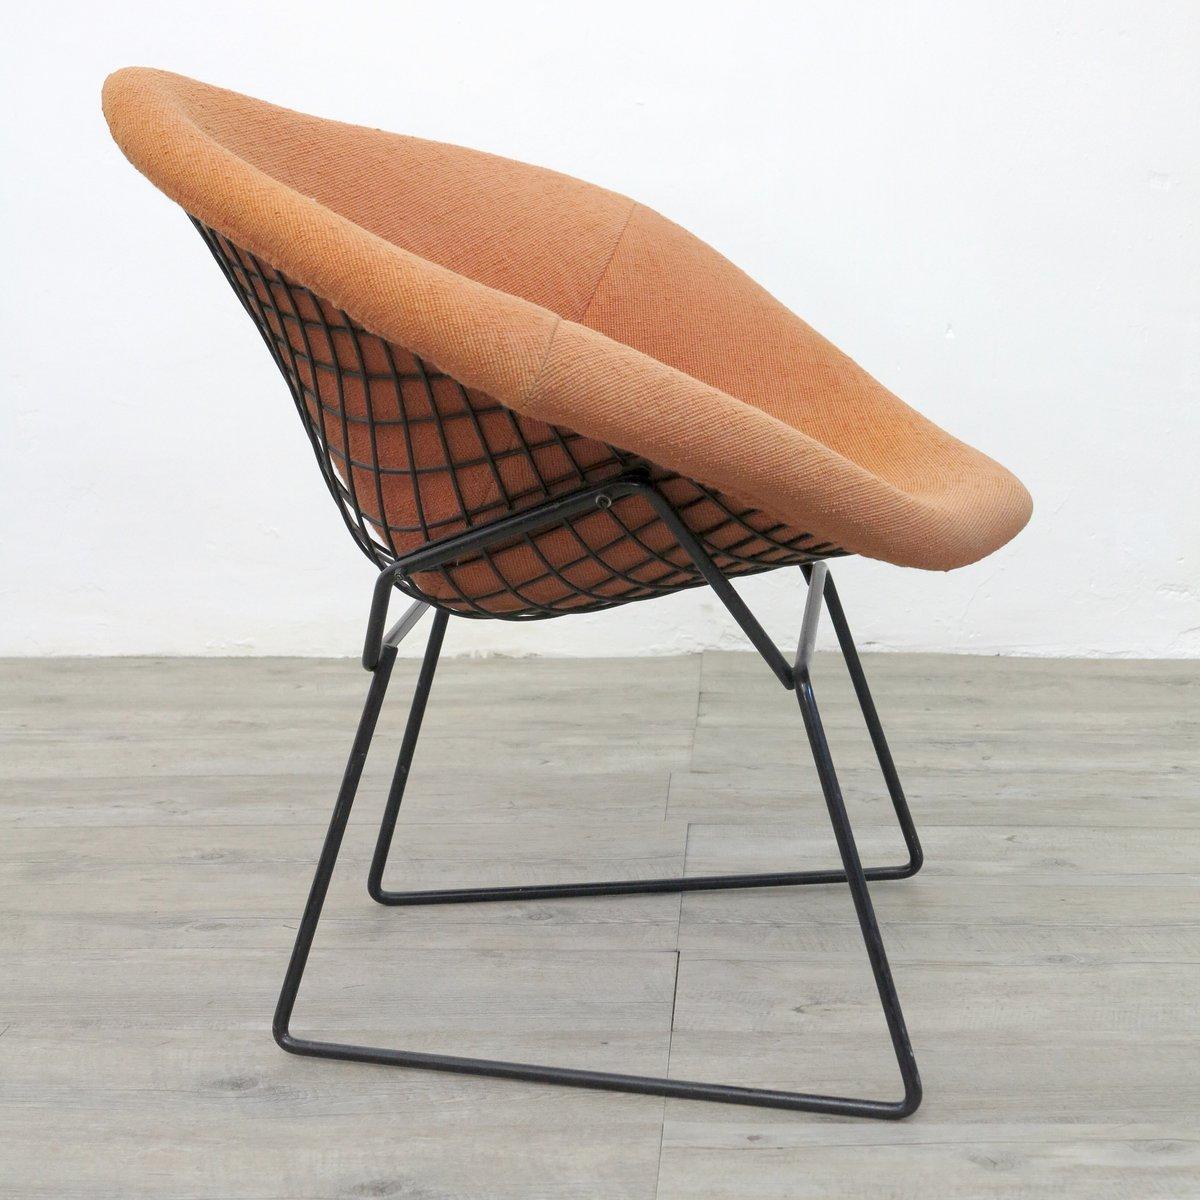 Harry bertoia for knoll inc bird chair catawiki -  Knoll Inc Bird Chair Catawiki Vintage Diamond Chair By Harry Bertoia For Download